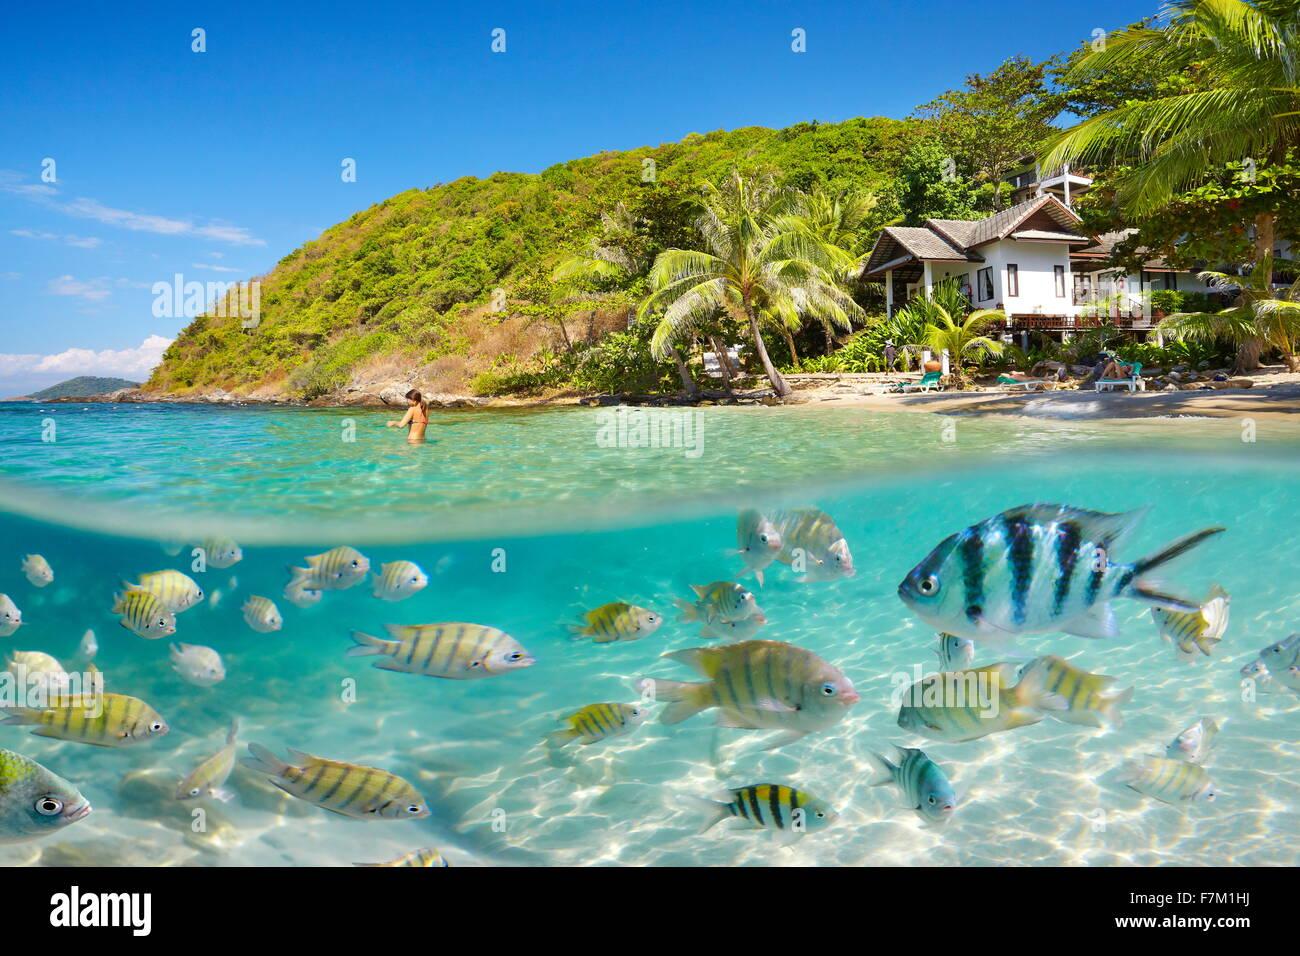 Underwater sea view at Ko Samet Island Beach, Thailand, Asia - Stock Image